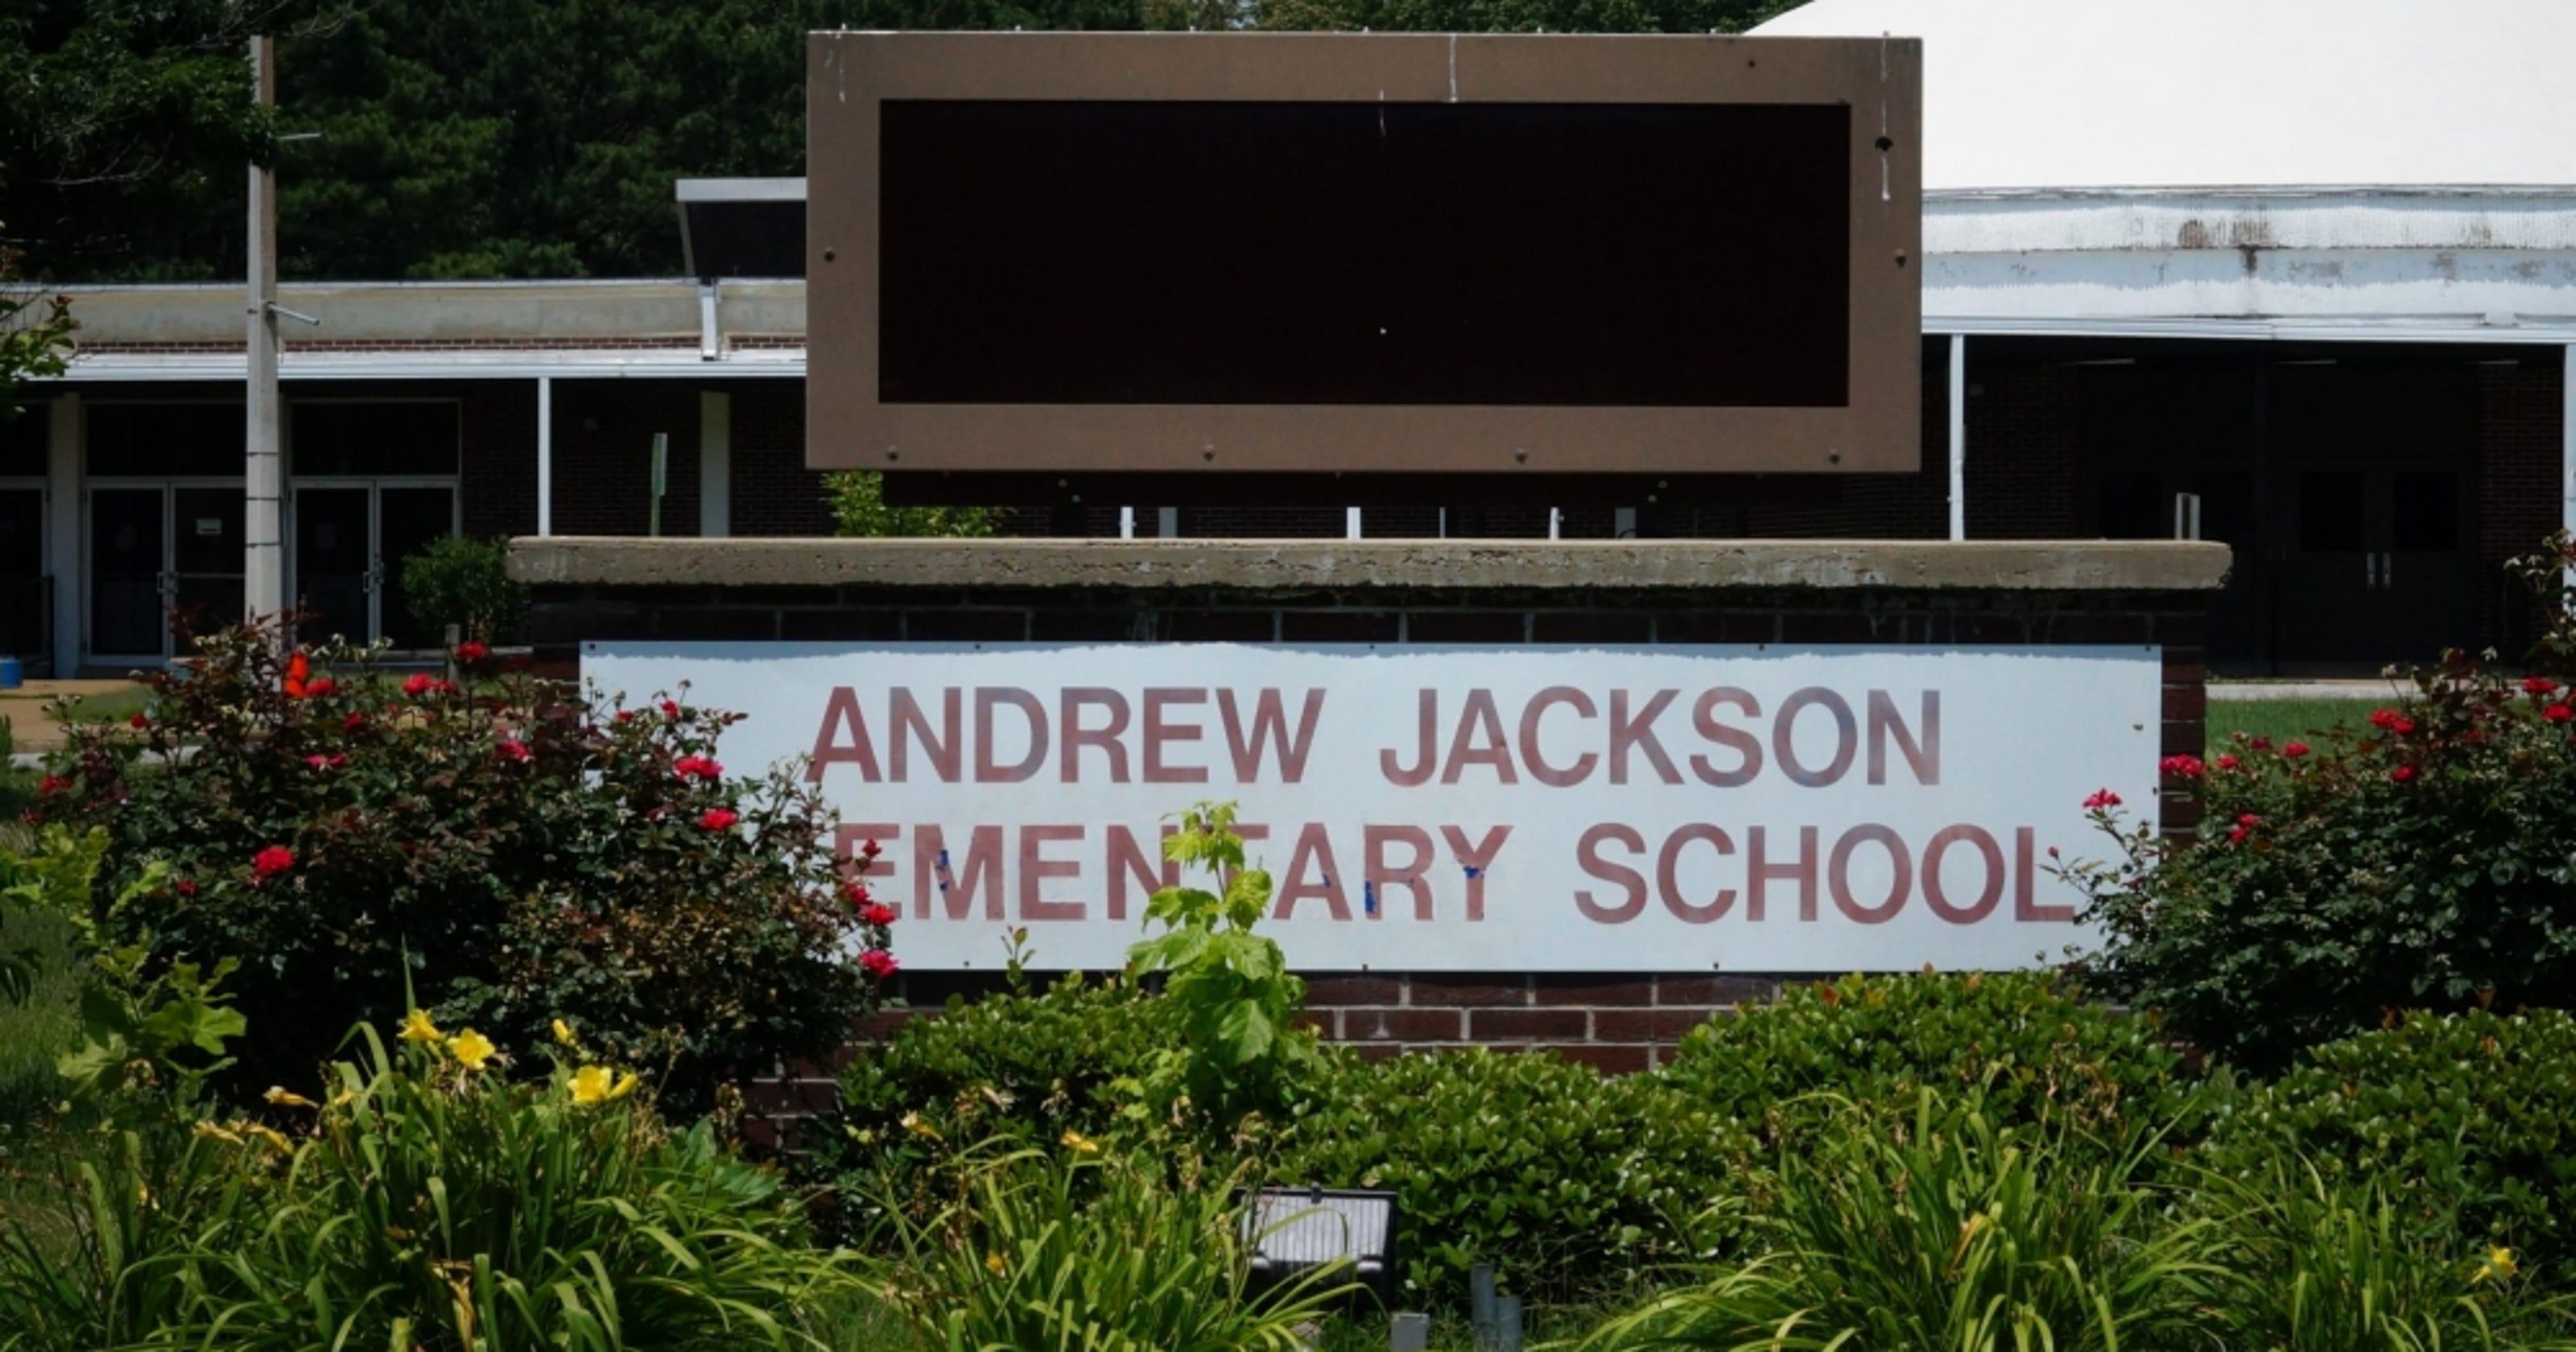 Toy Gun Found At Andrew Jackson Elementary